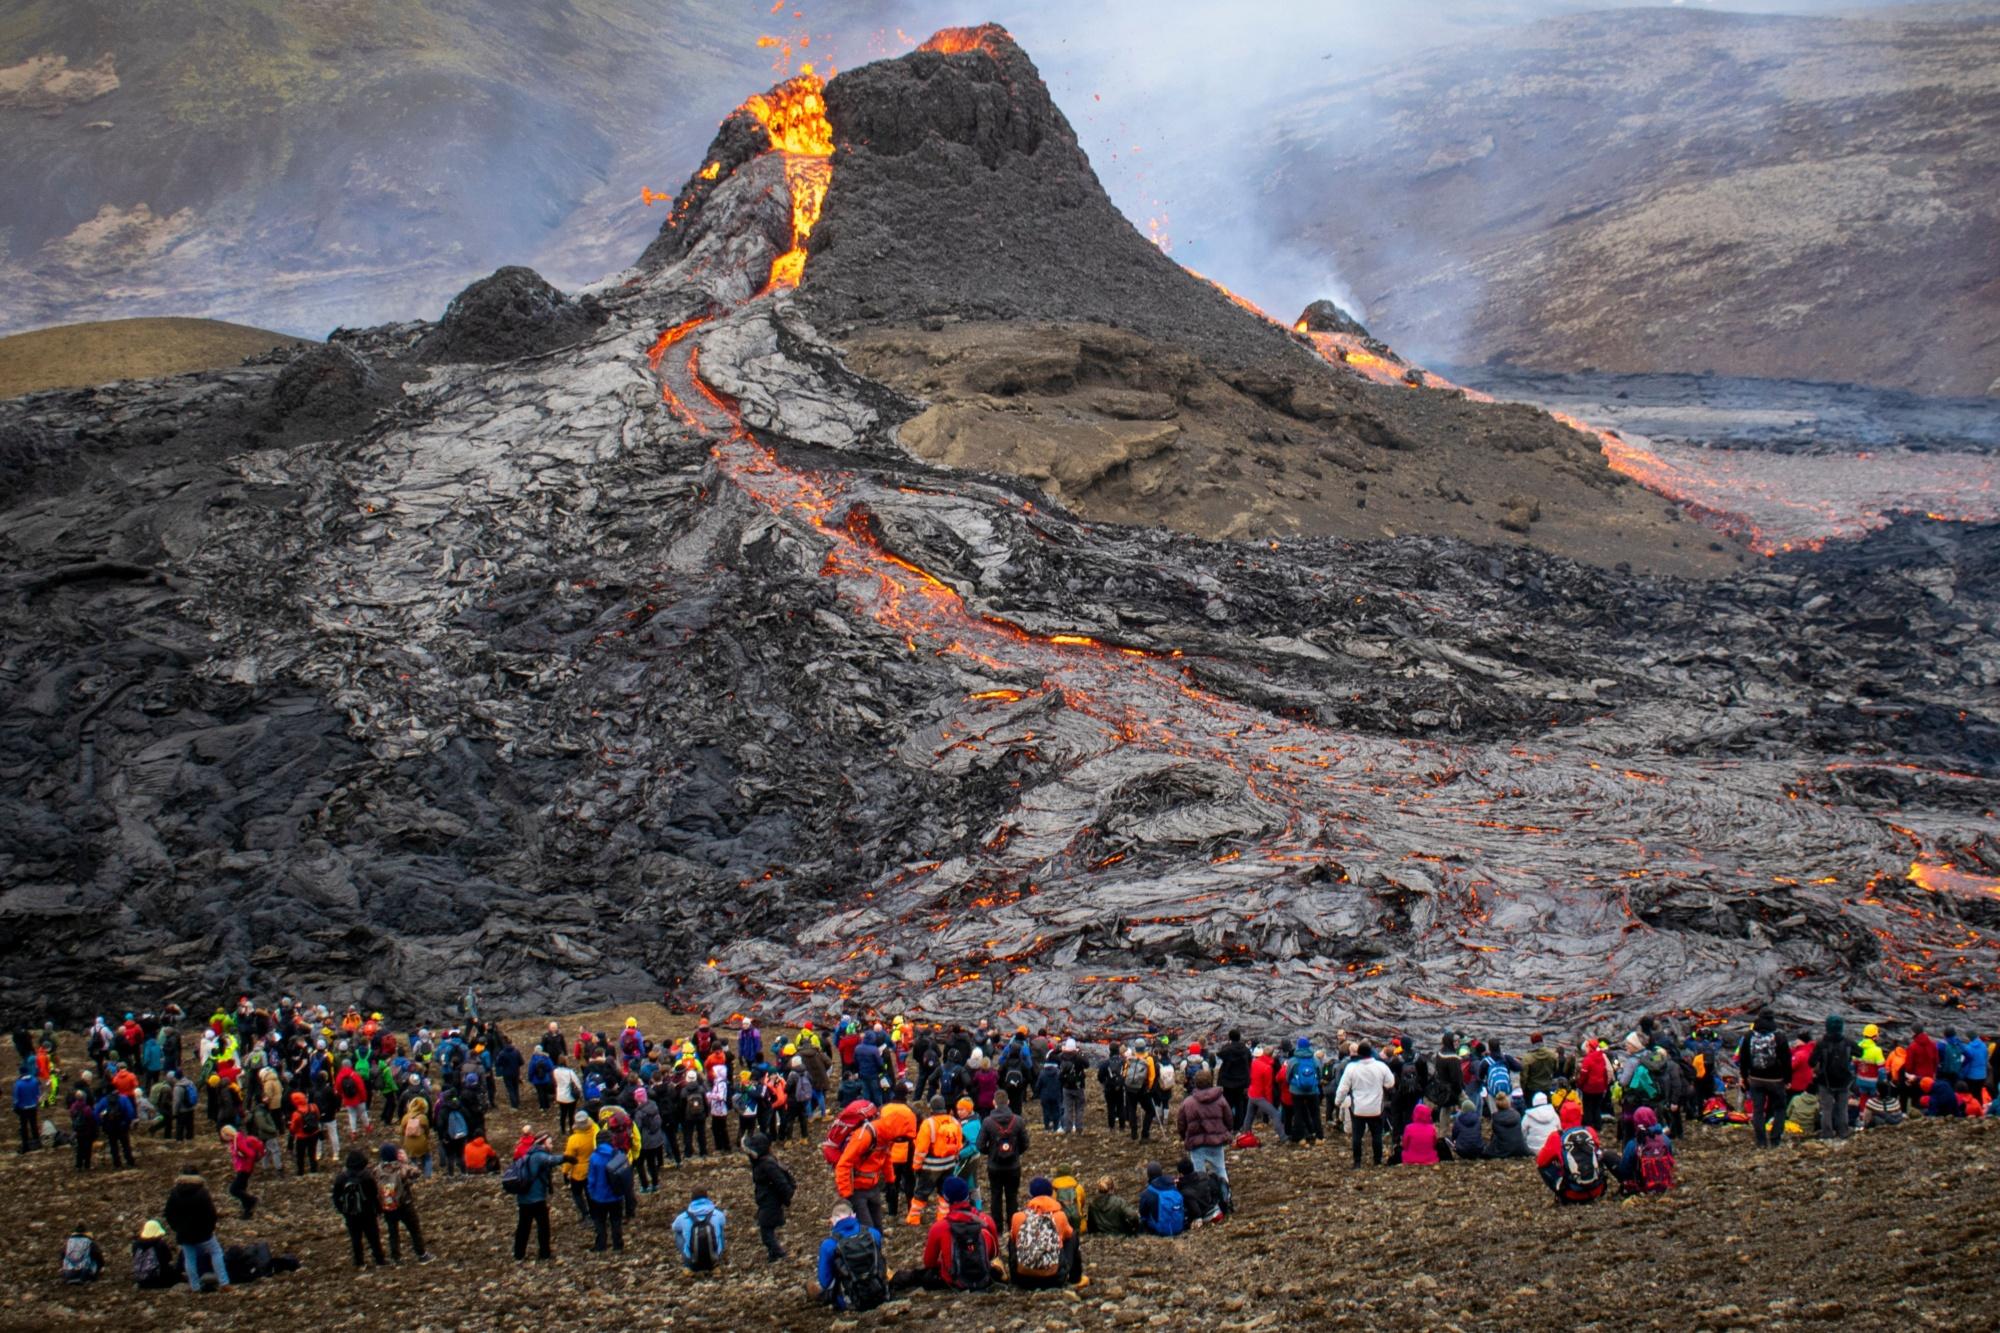 TOPSHOT-ICELAND-VOLCANO-ERUPTION